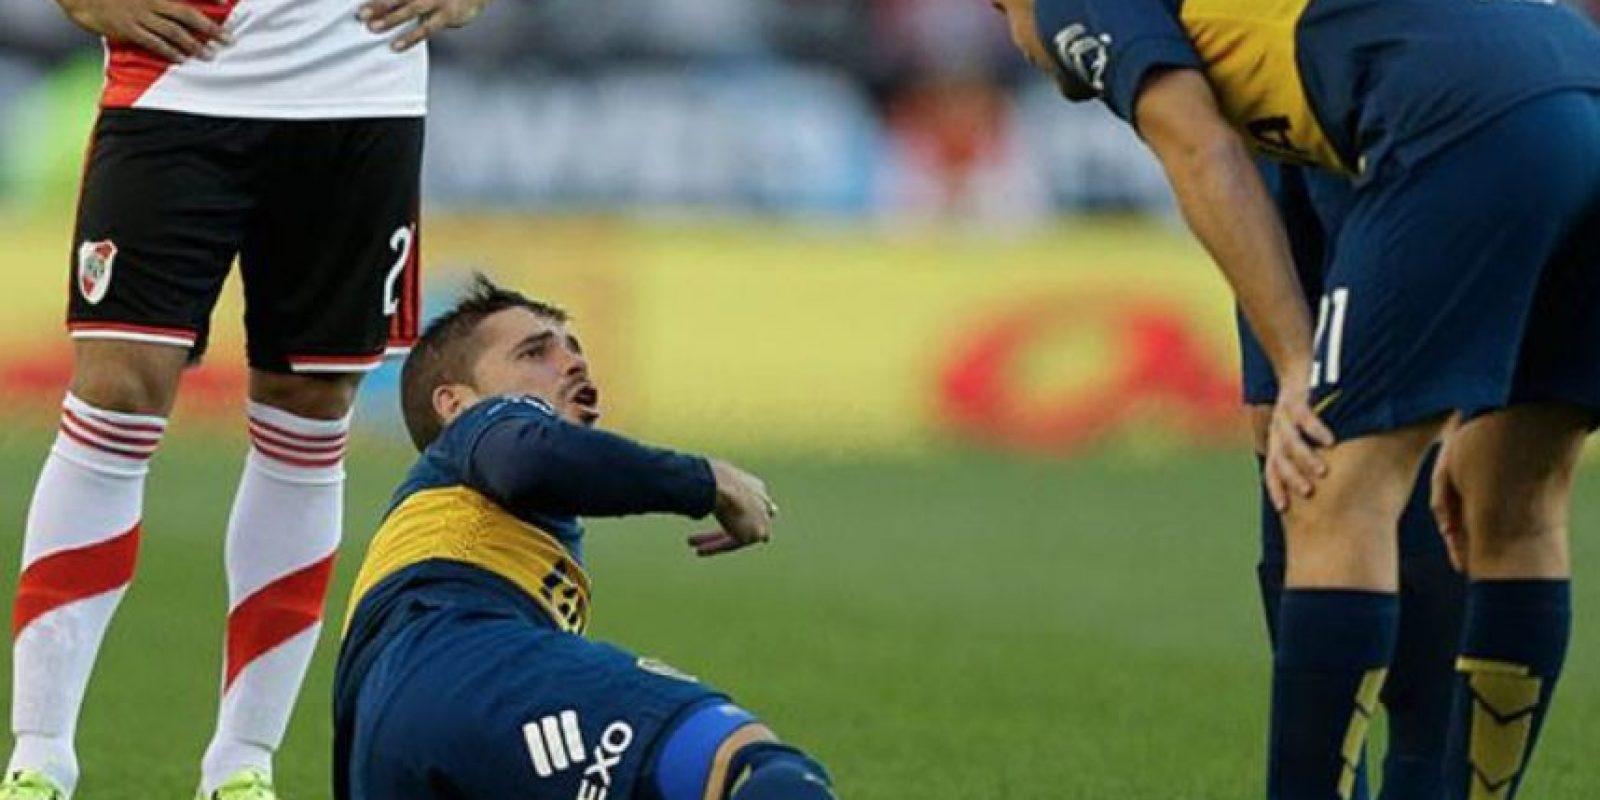 Fernando Gago se rompió el tendón de Aquiles, antes de que se jugara un minuto de partido Foto:Twitter